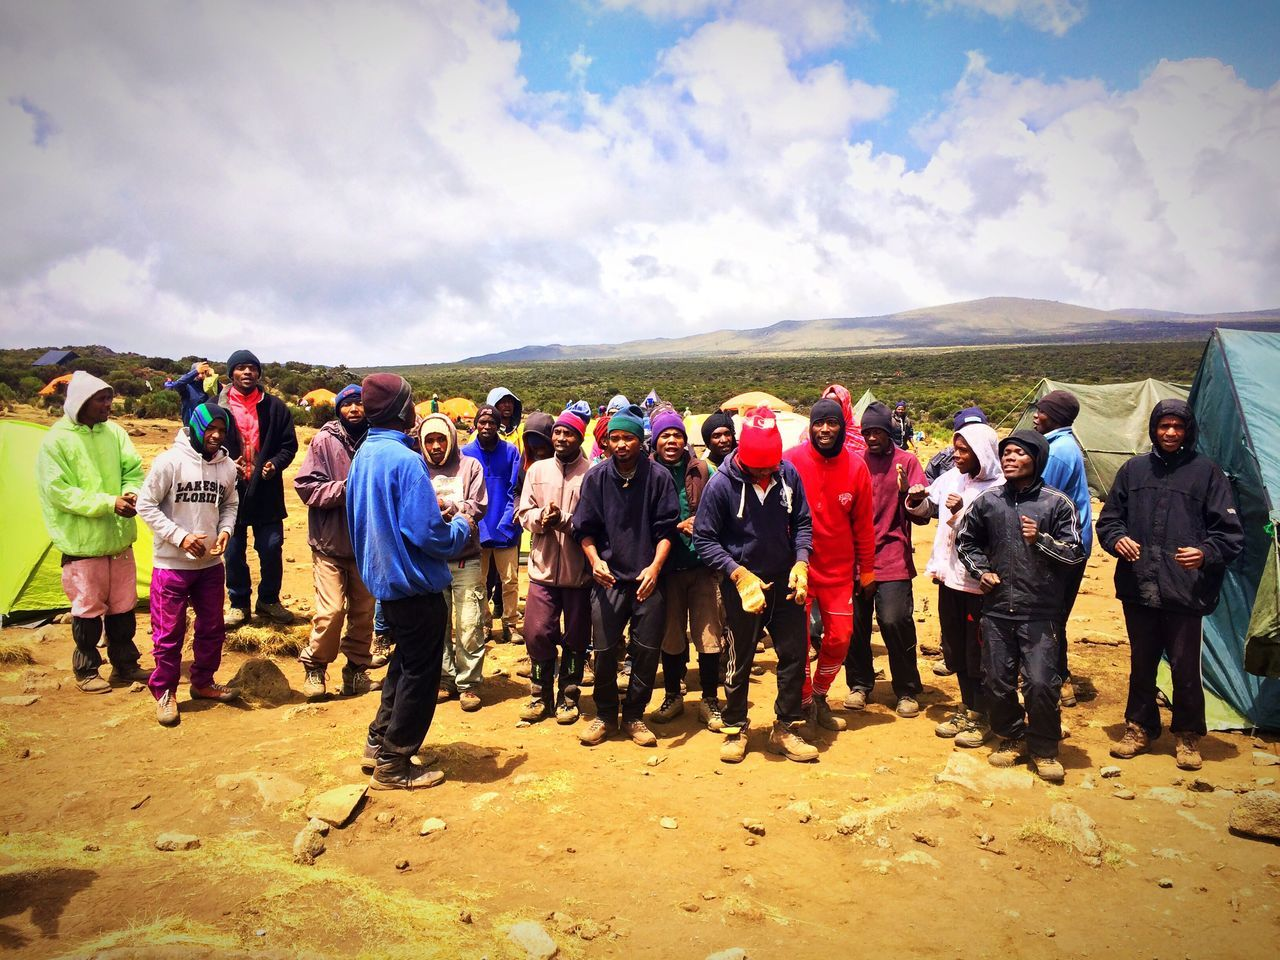 Kilimanjaro Portors Kilimanjaronationalpark Trekking Singing Outdoors Mountain Mountain Photography TrekkingDay Adventure Tanzania Amazing People Adventure Holiday Gadventures Travel Travel Photography